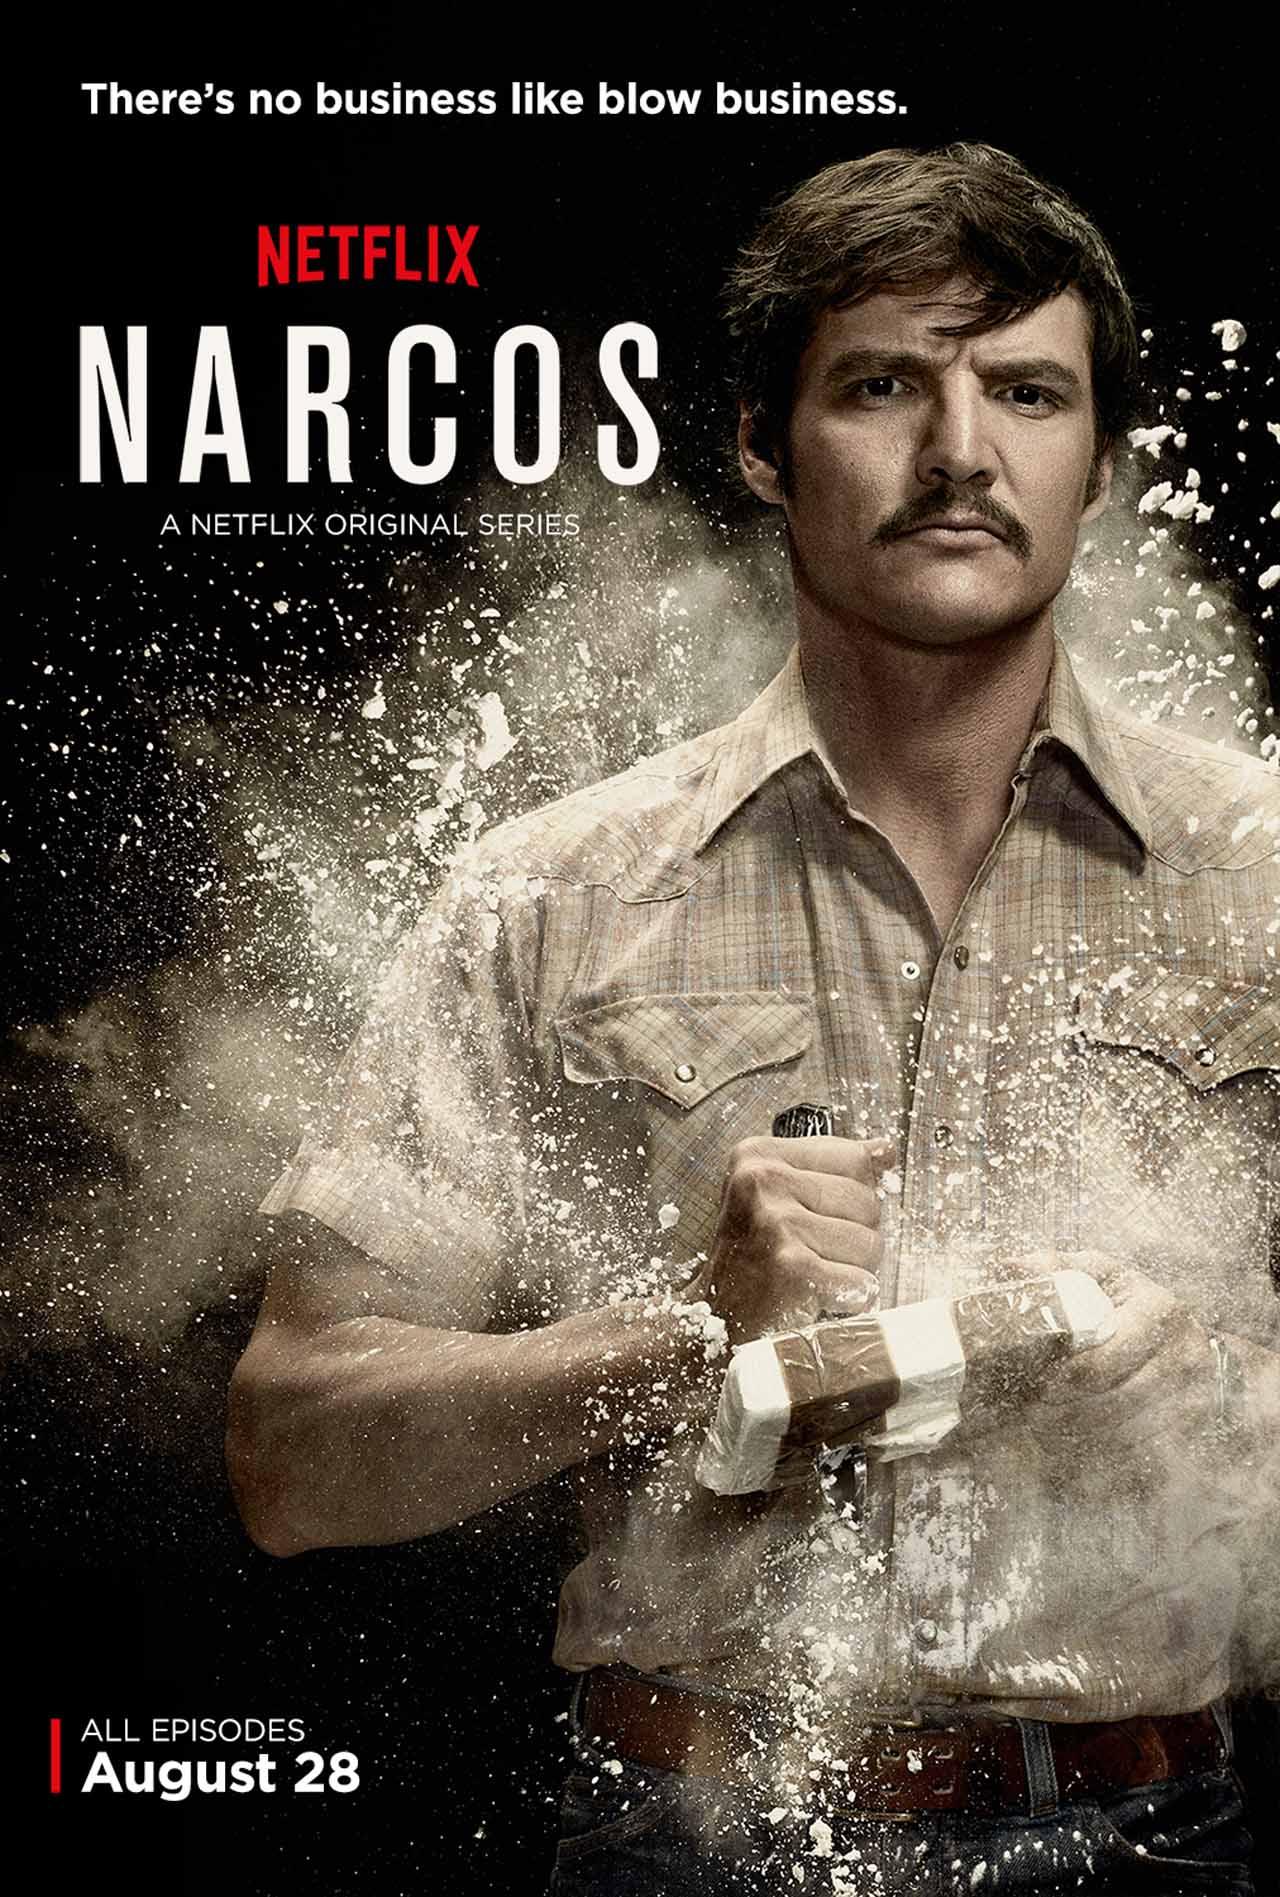 Narcos Season 3 Wallpapers - Wallpaper Cave